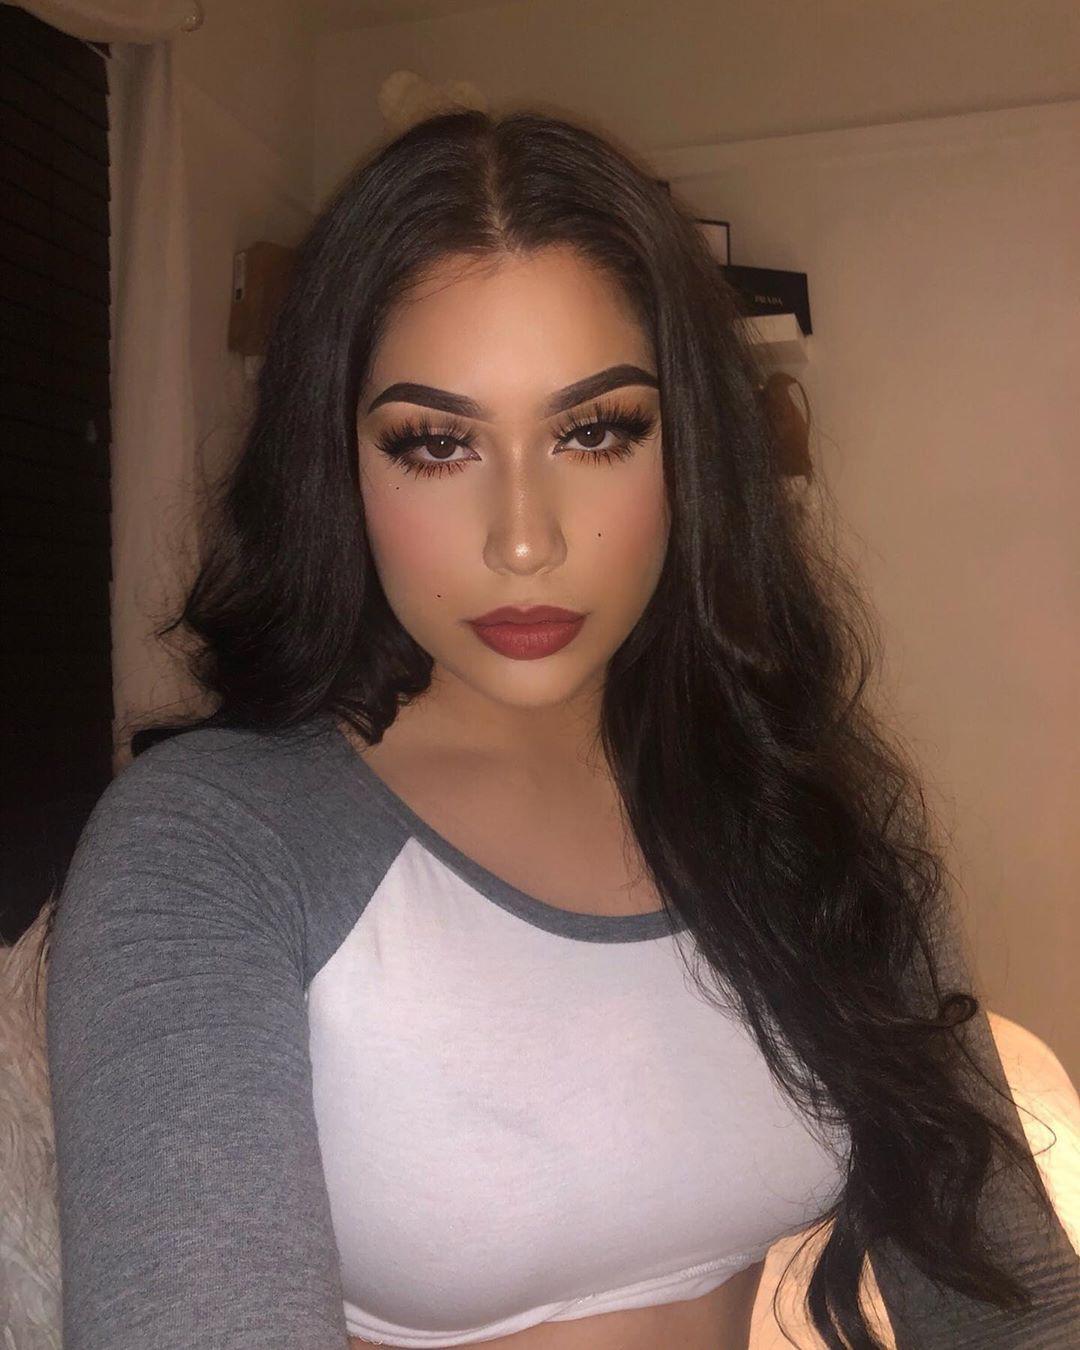 Alondra Mendoza Black Hairstyle For Girls, Beautiful And Cute Girls, Natural Glossy Lips